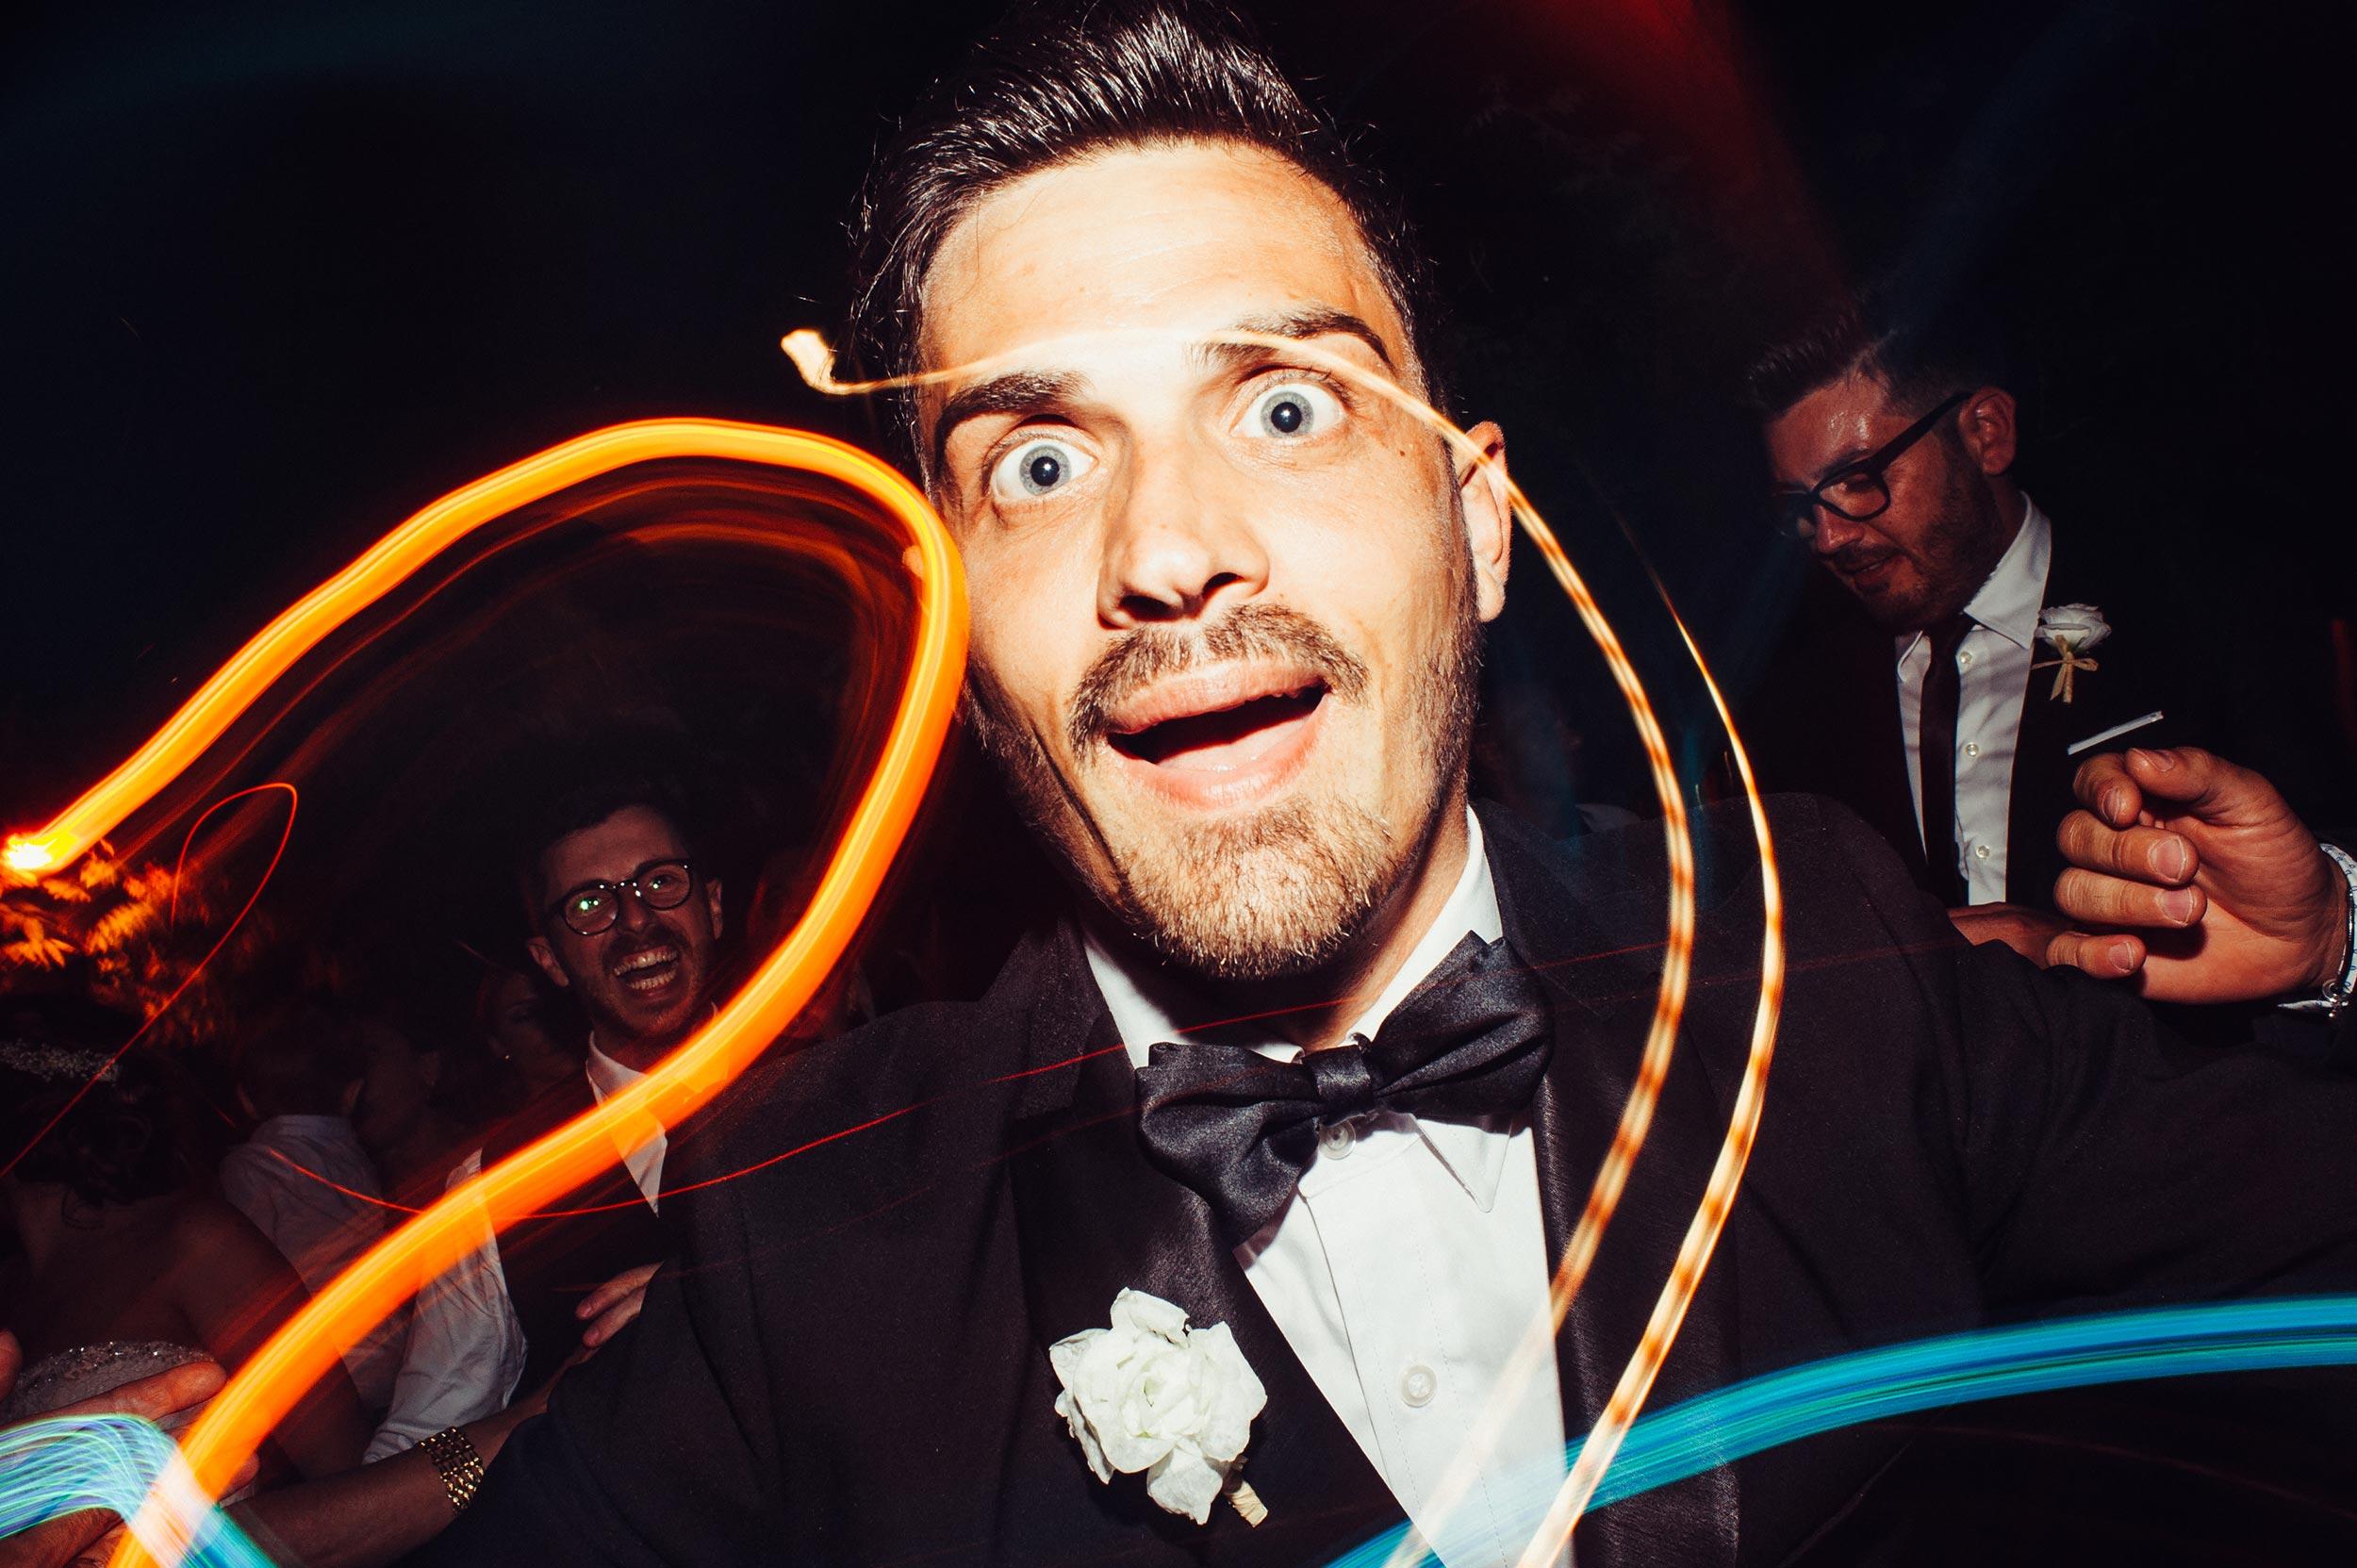 2016-Claudio-Teresa-Naples-Wedding-Photographer-Italy-Alessandro-Avenali-104.jpg